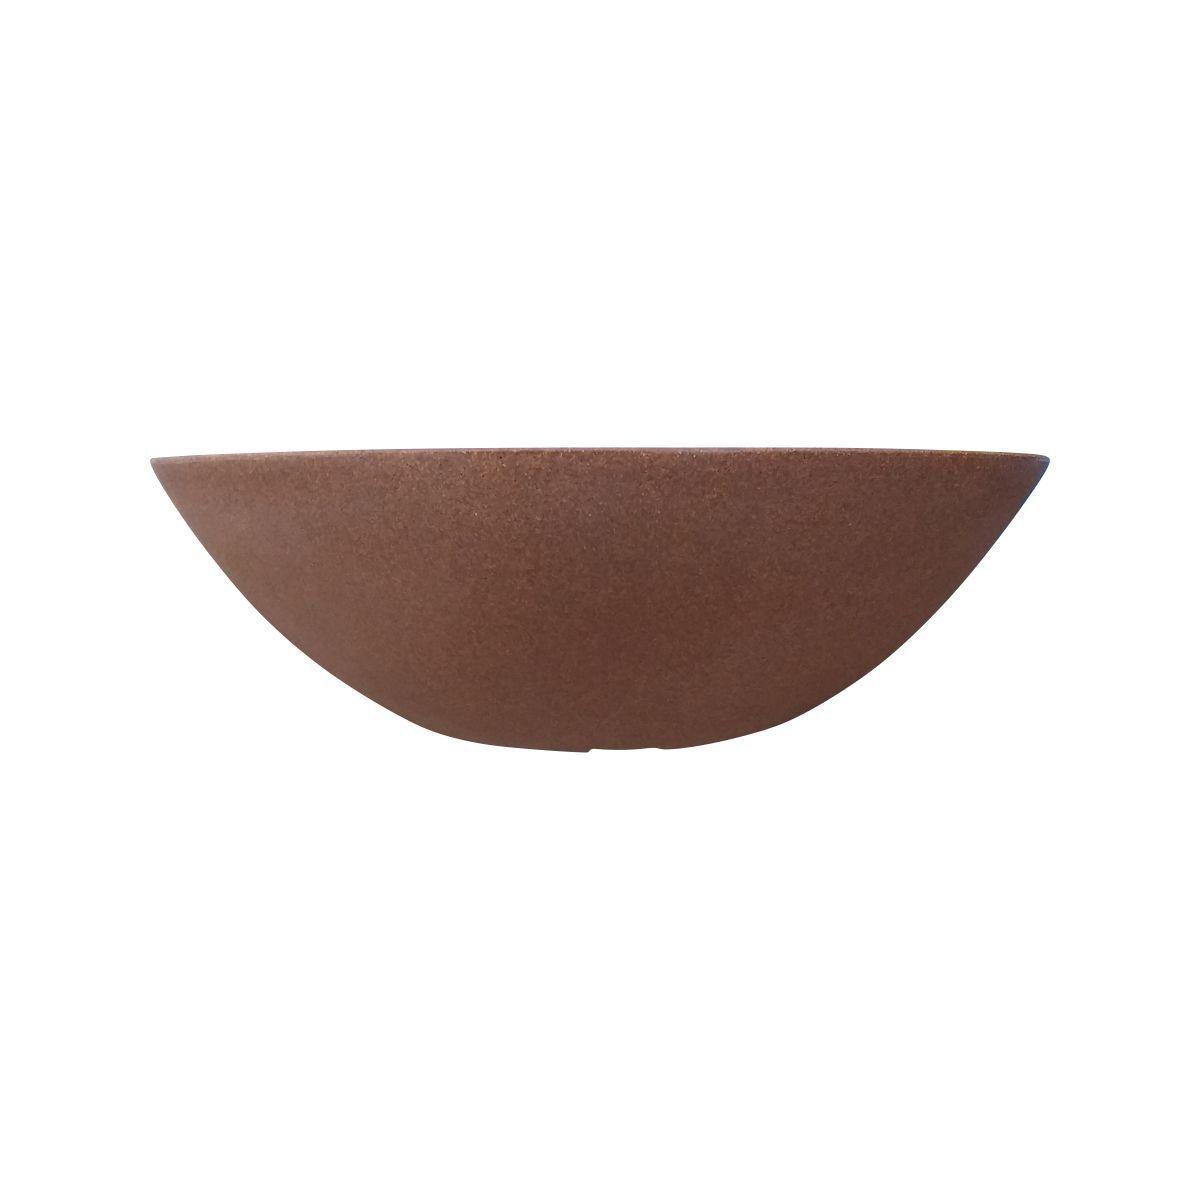 Vaso Bacia Pequeno cor Argila 12cm x 35cm - 6694